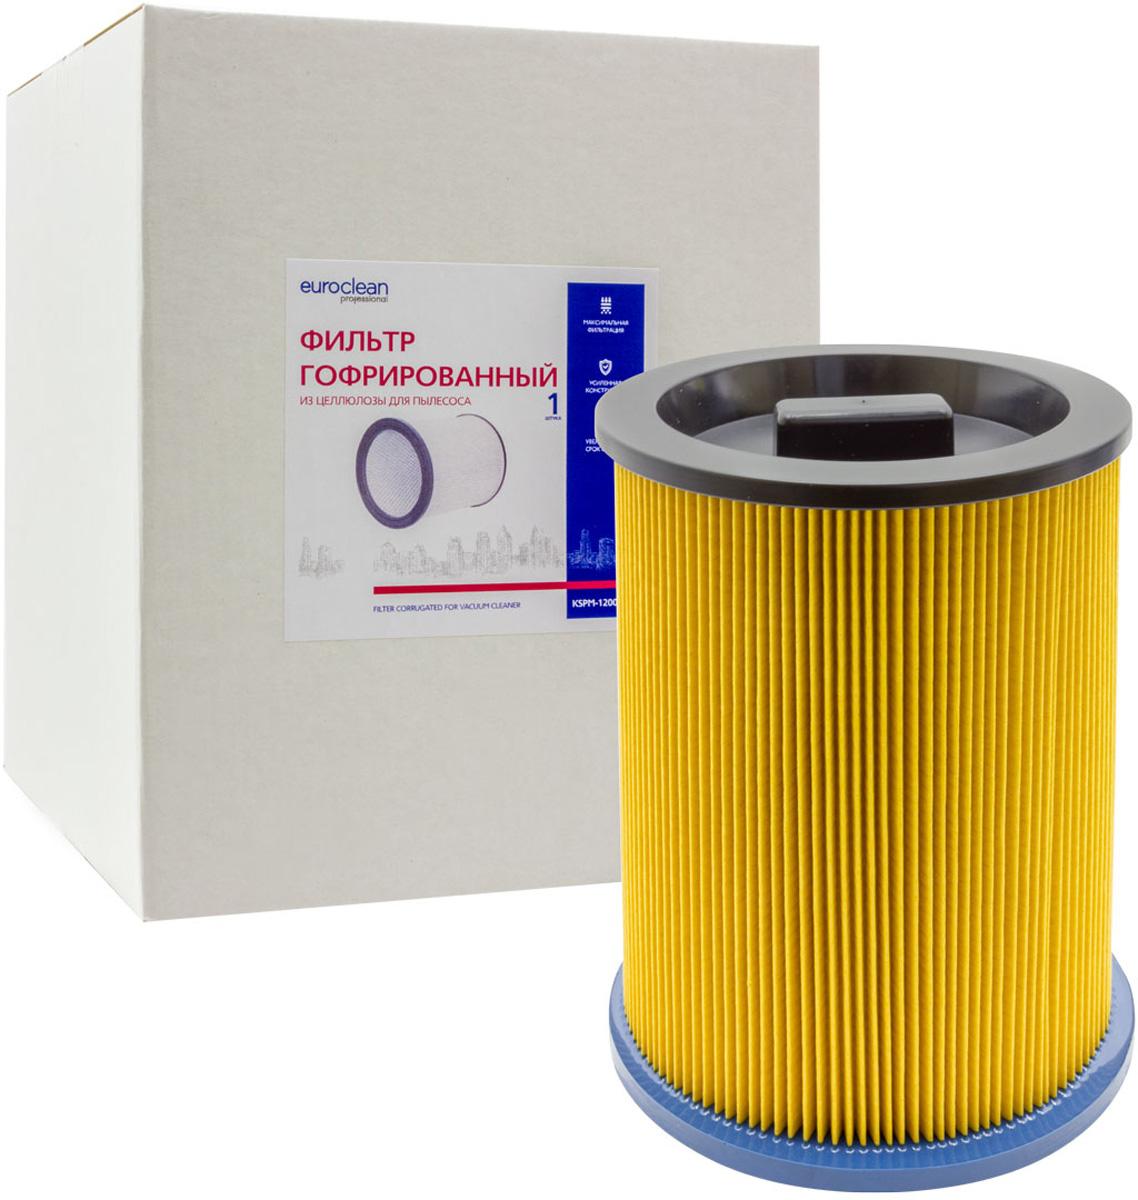 Euroclean KSPM-1200NTX фильтр складчатый для сухой пыли к пылесосам Kress (аналог 98043501) euroclean flsm as20 фильтр складчатый многоразовый моющийся для пылесосов felisatti as20 1200